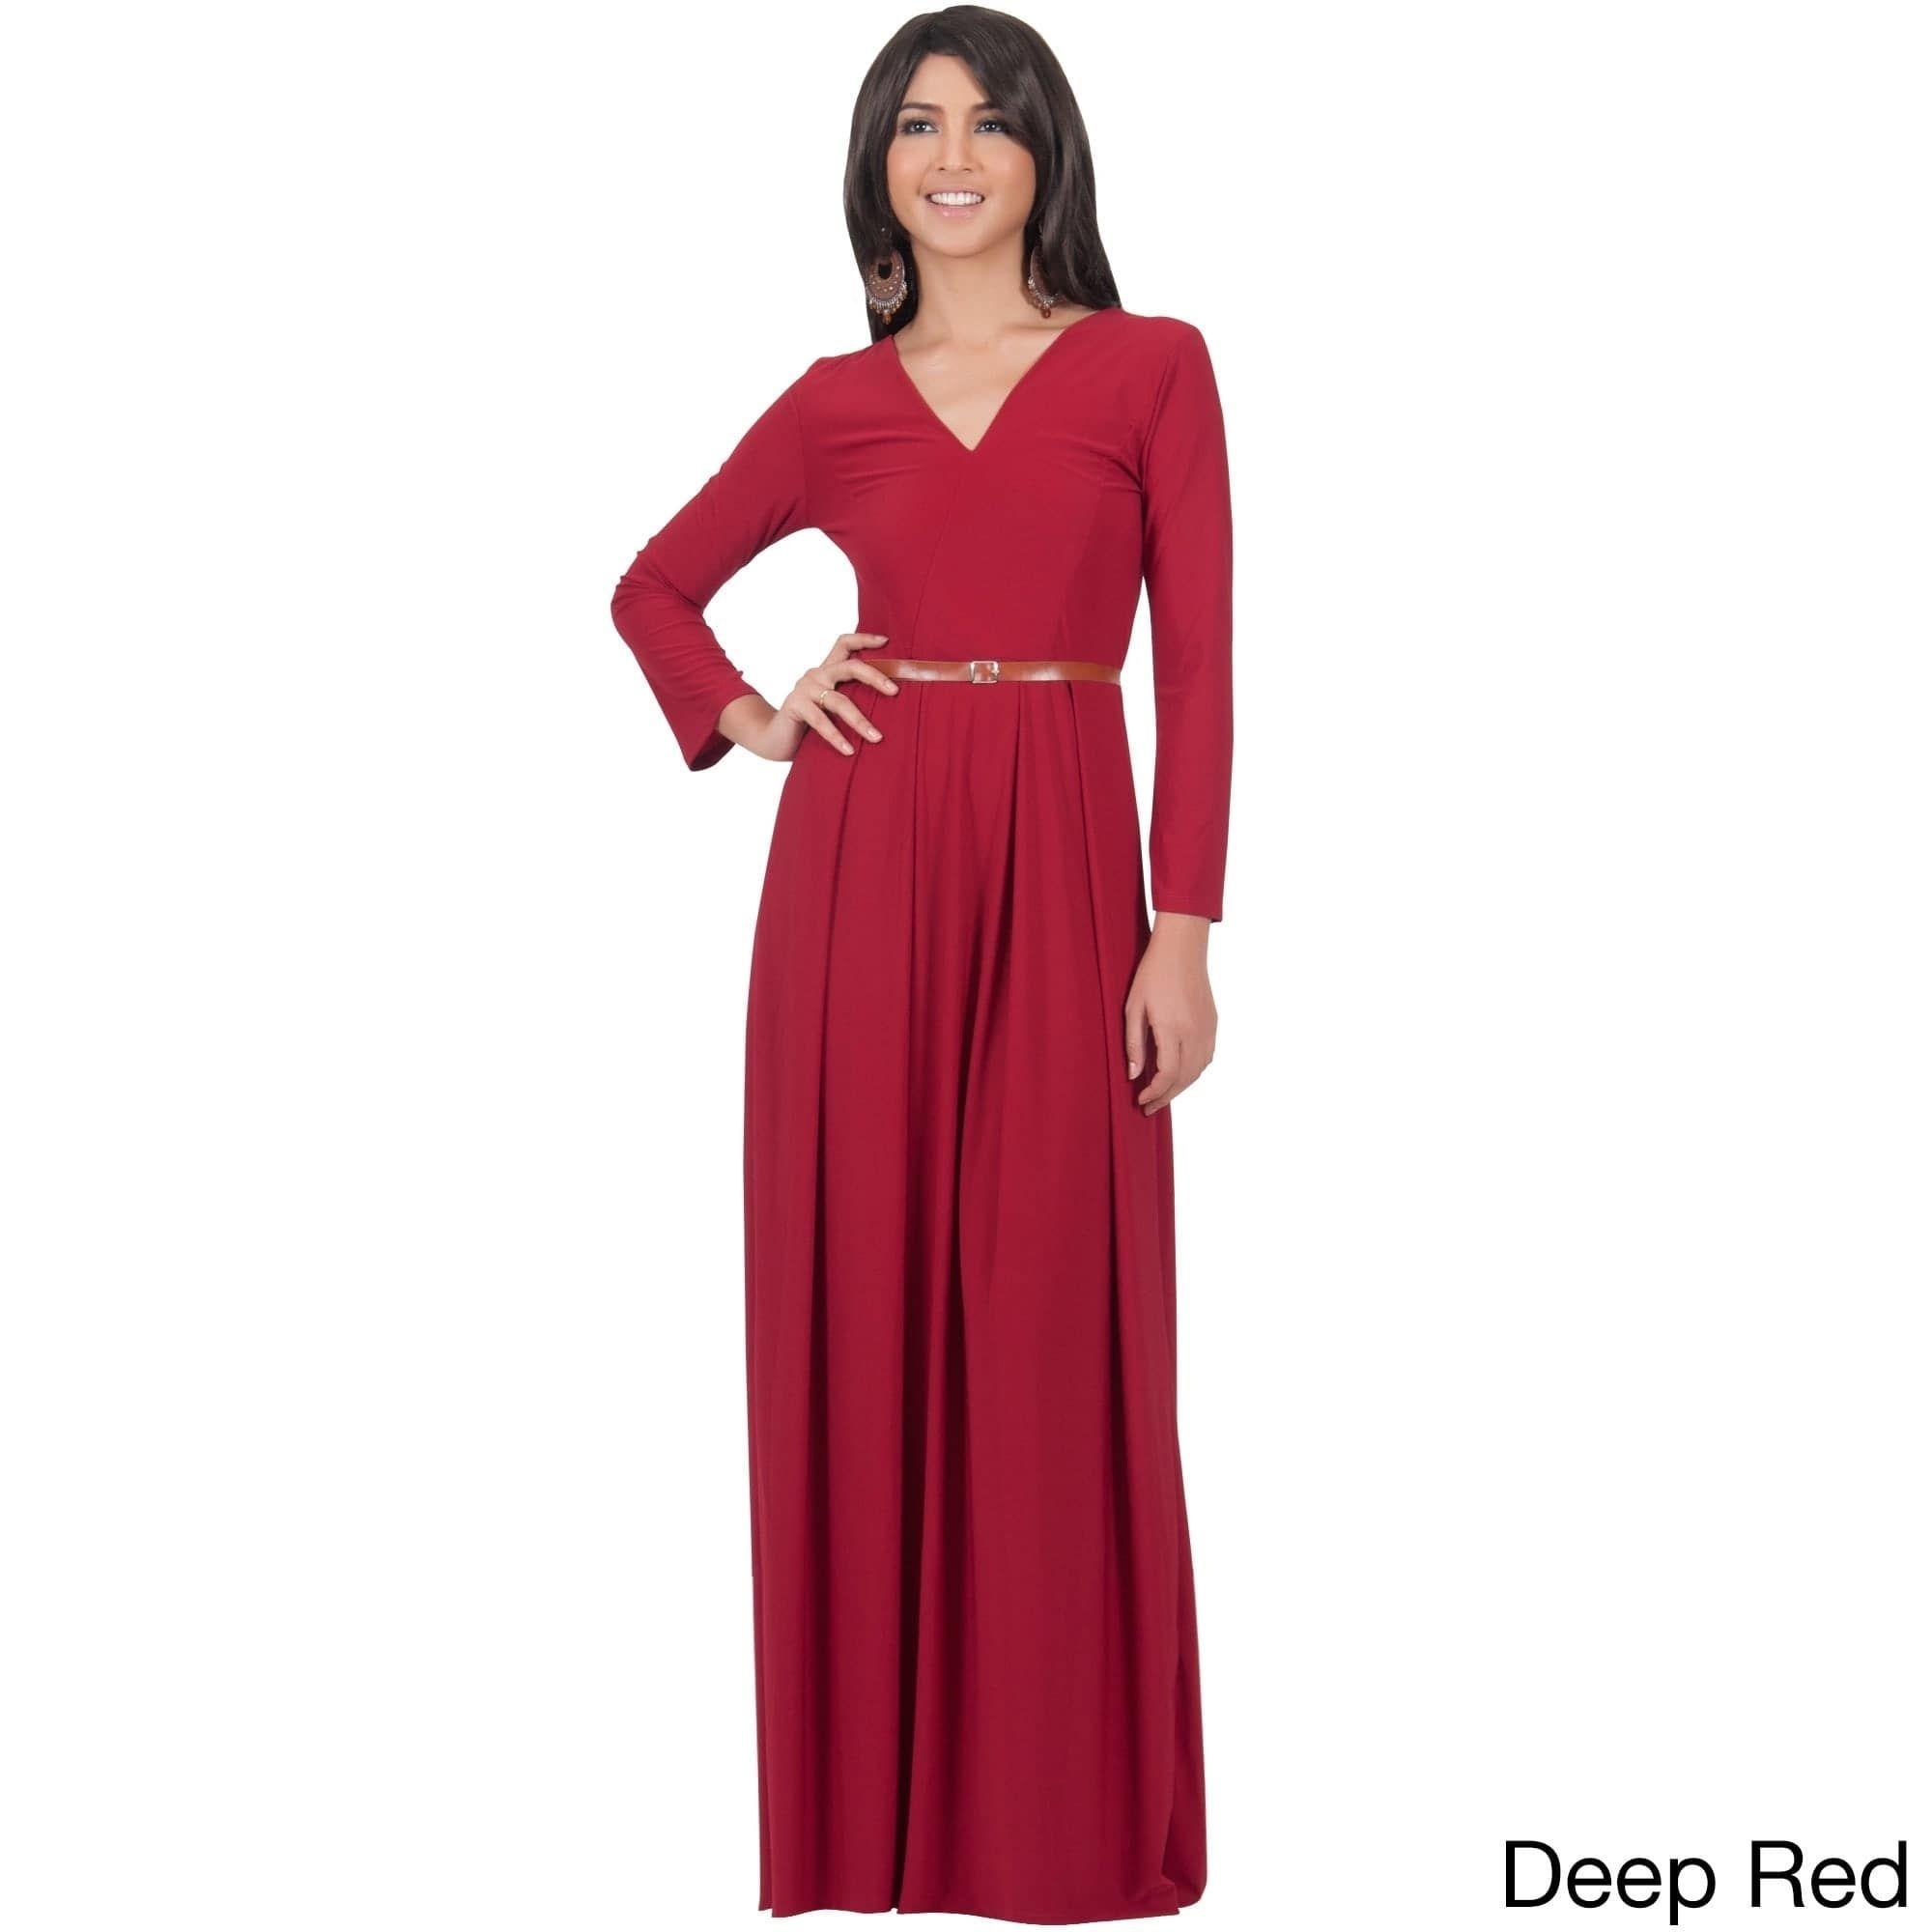 Global koh koh womens vneck long sleeve elegant evening formal maxi